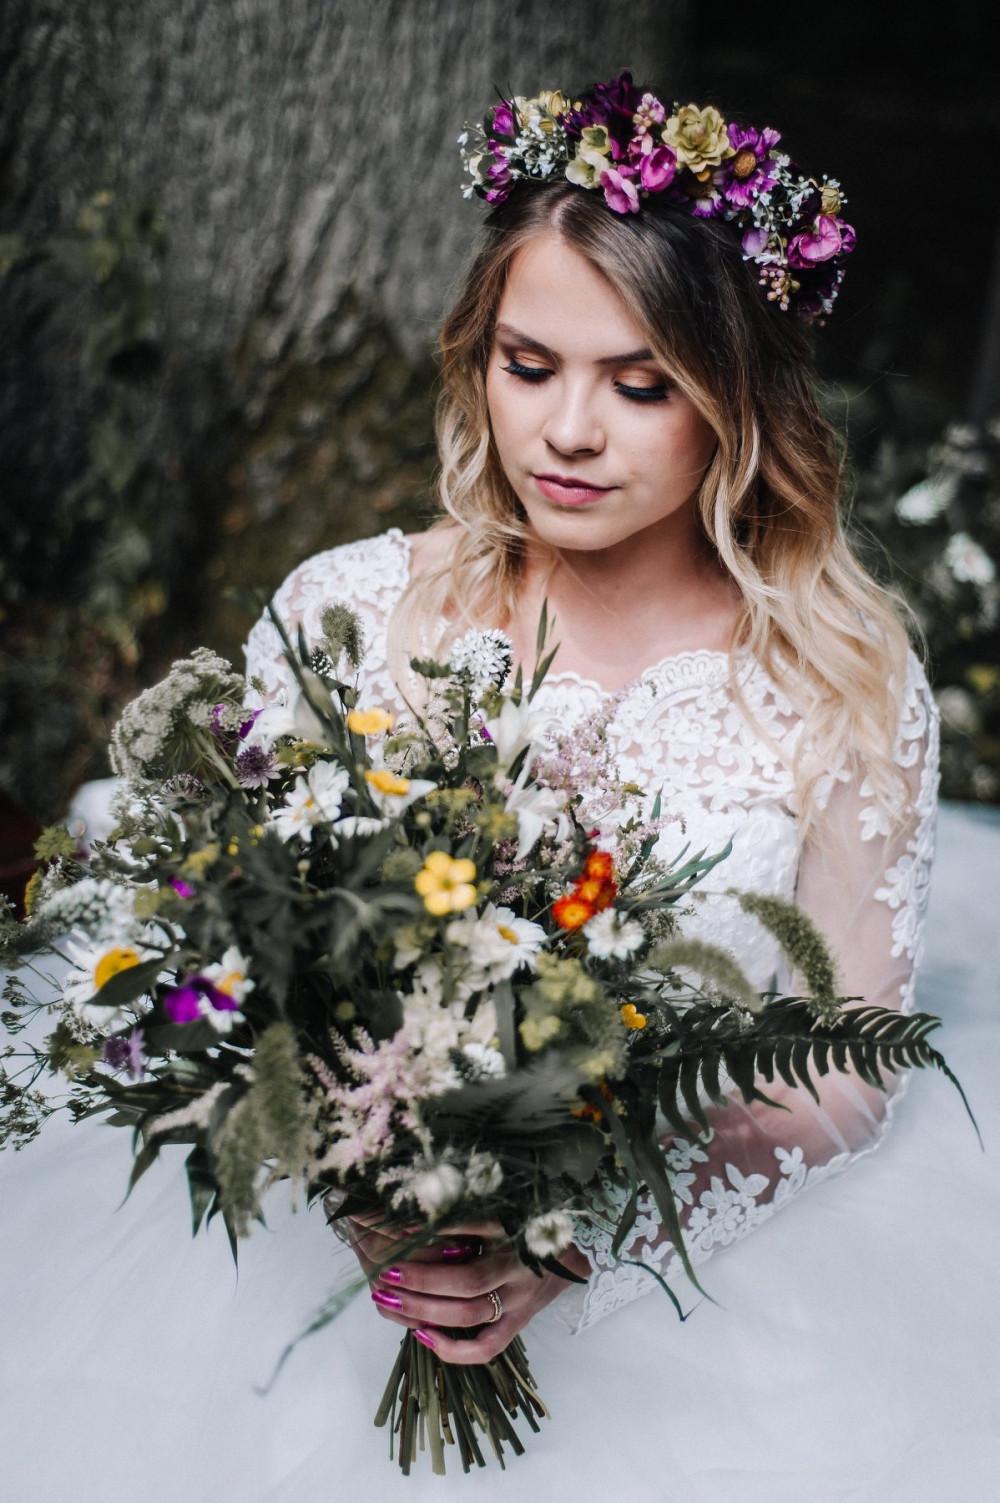 - Make Me Bridal Artist: Nicola Jane - Makeup Artist. Photography by: Popsicle photography. #boho #bohobride #flowercrown #bridalmakeup #airbrushedmakeup #mac #airbrush